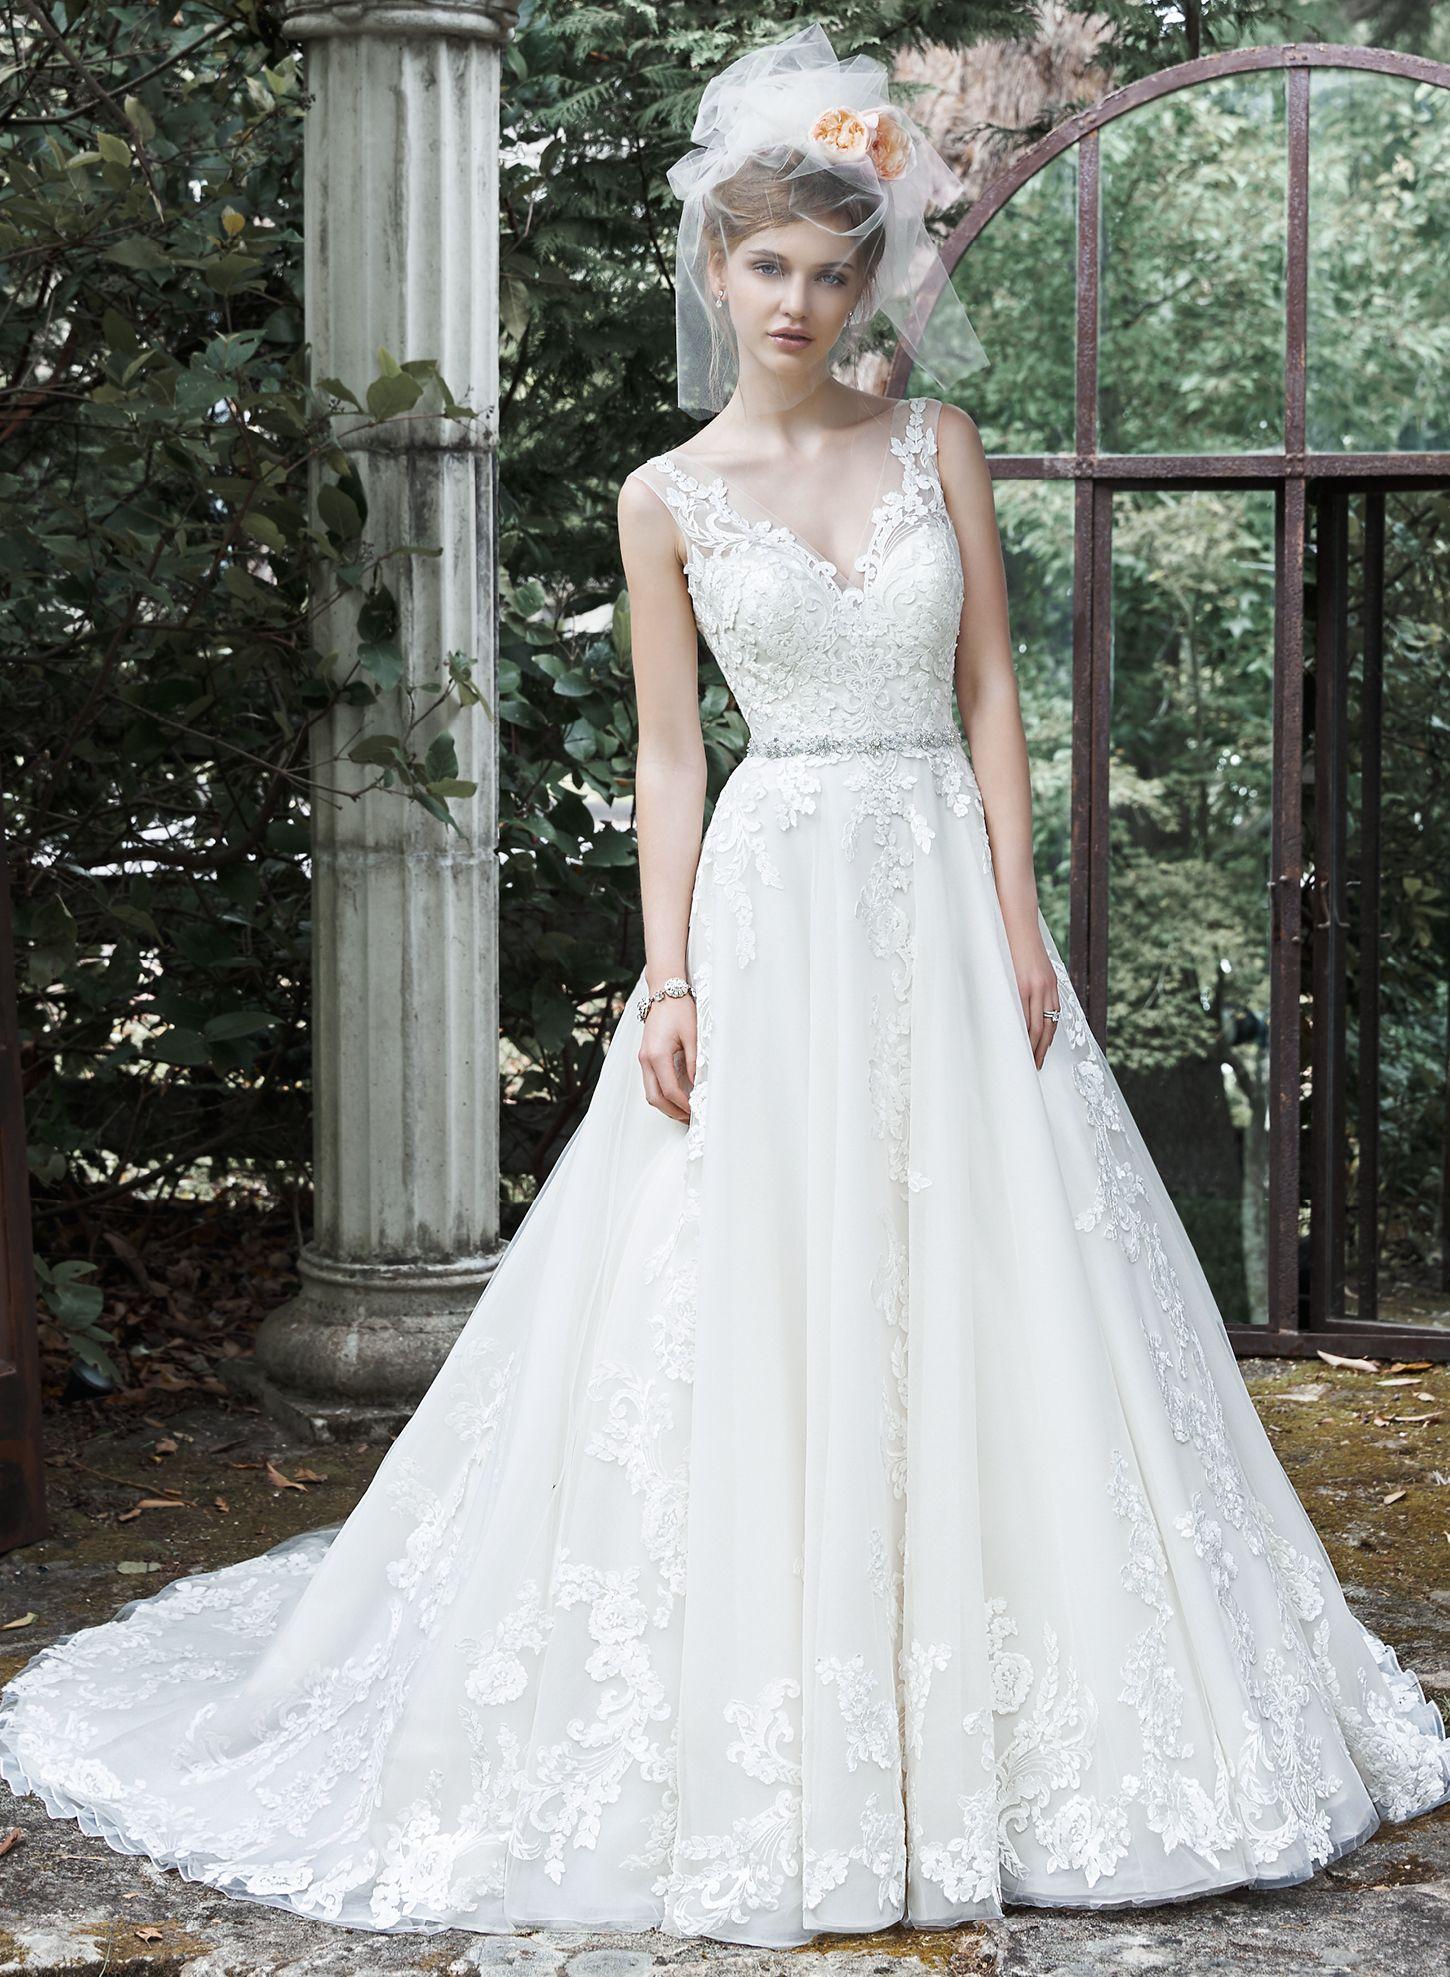 Maggie sottero wedding dresses maggie sottero wedding dress and sybil by maggie sottero available at bella sera bridal 509 663 0121 junglespirit Gallery